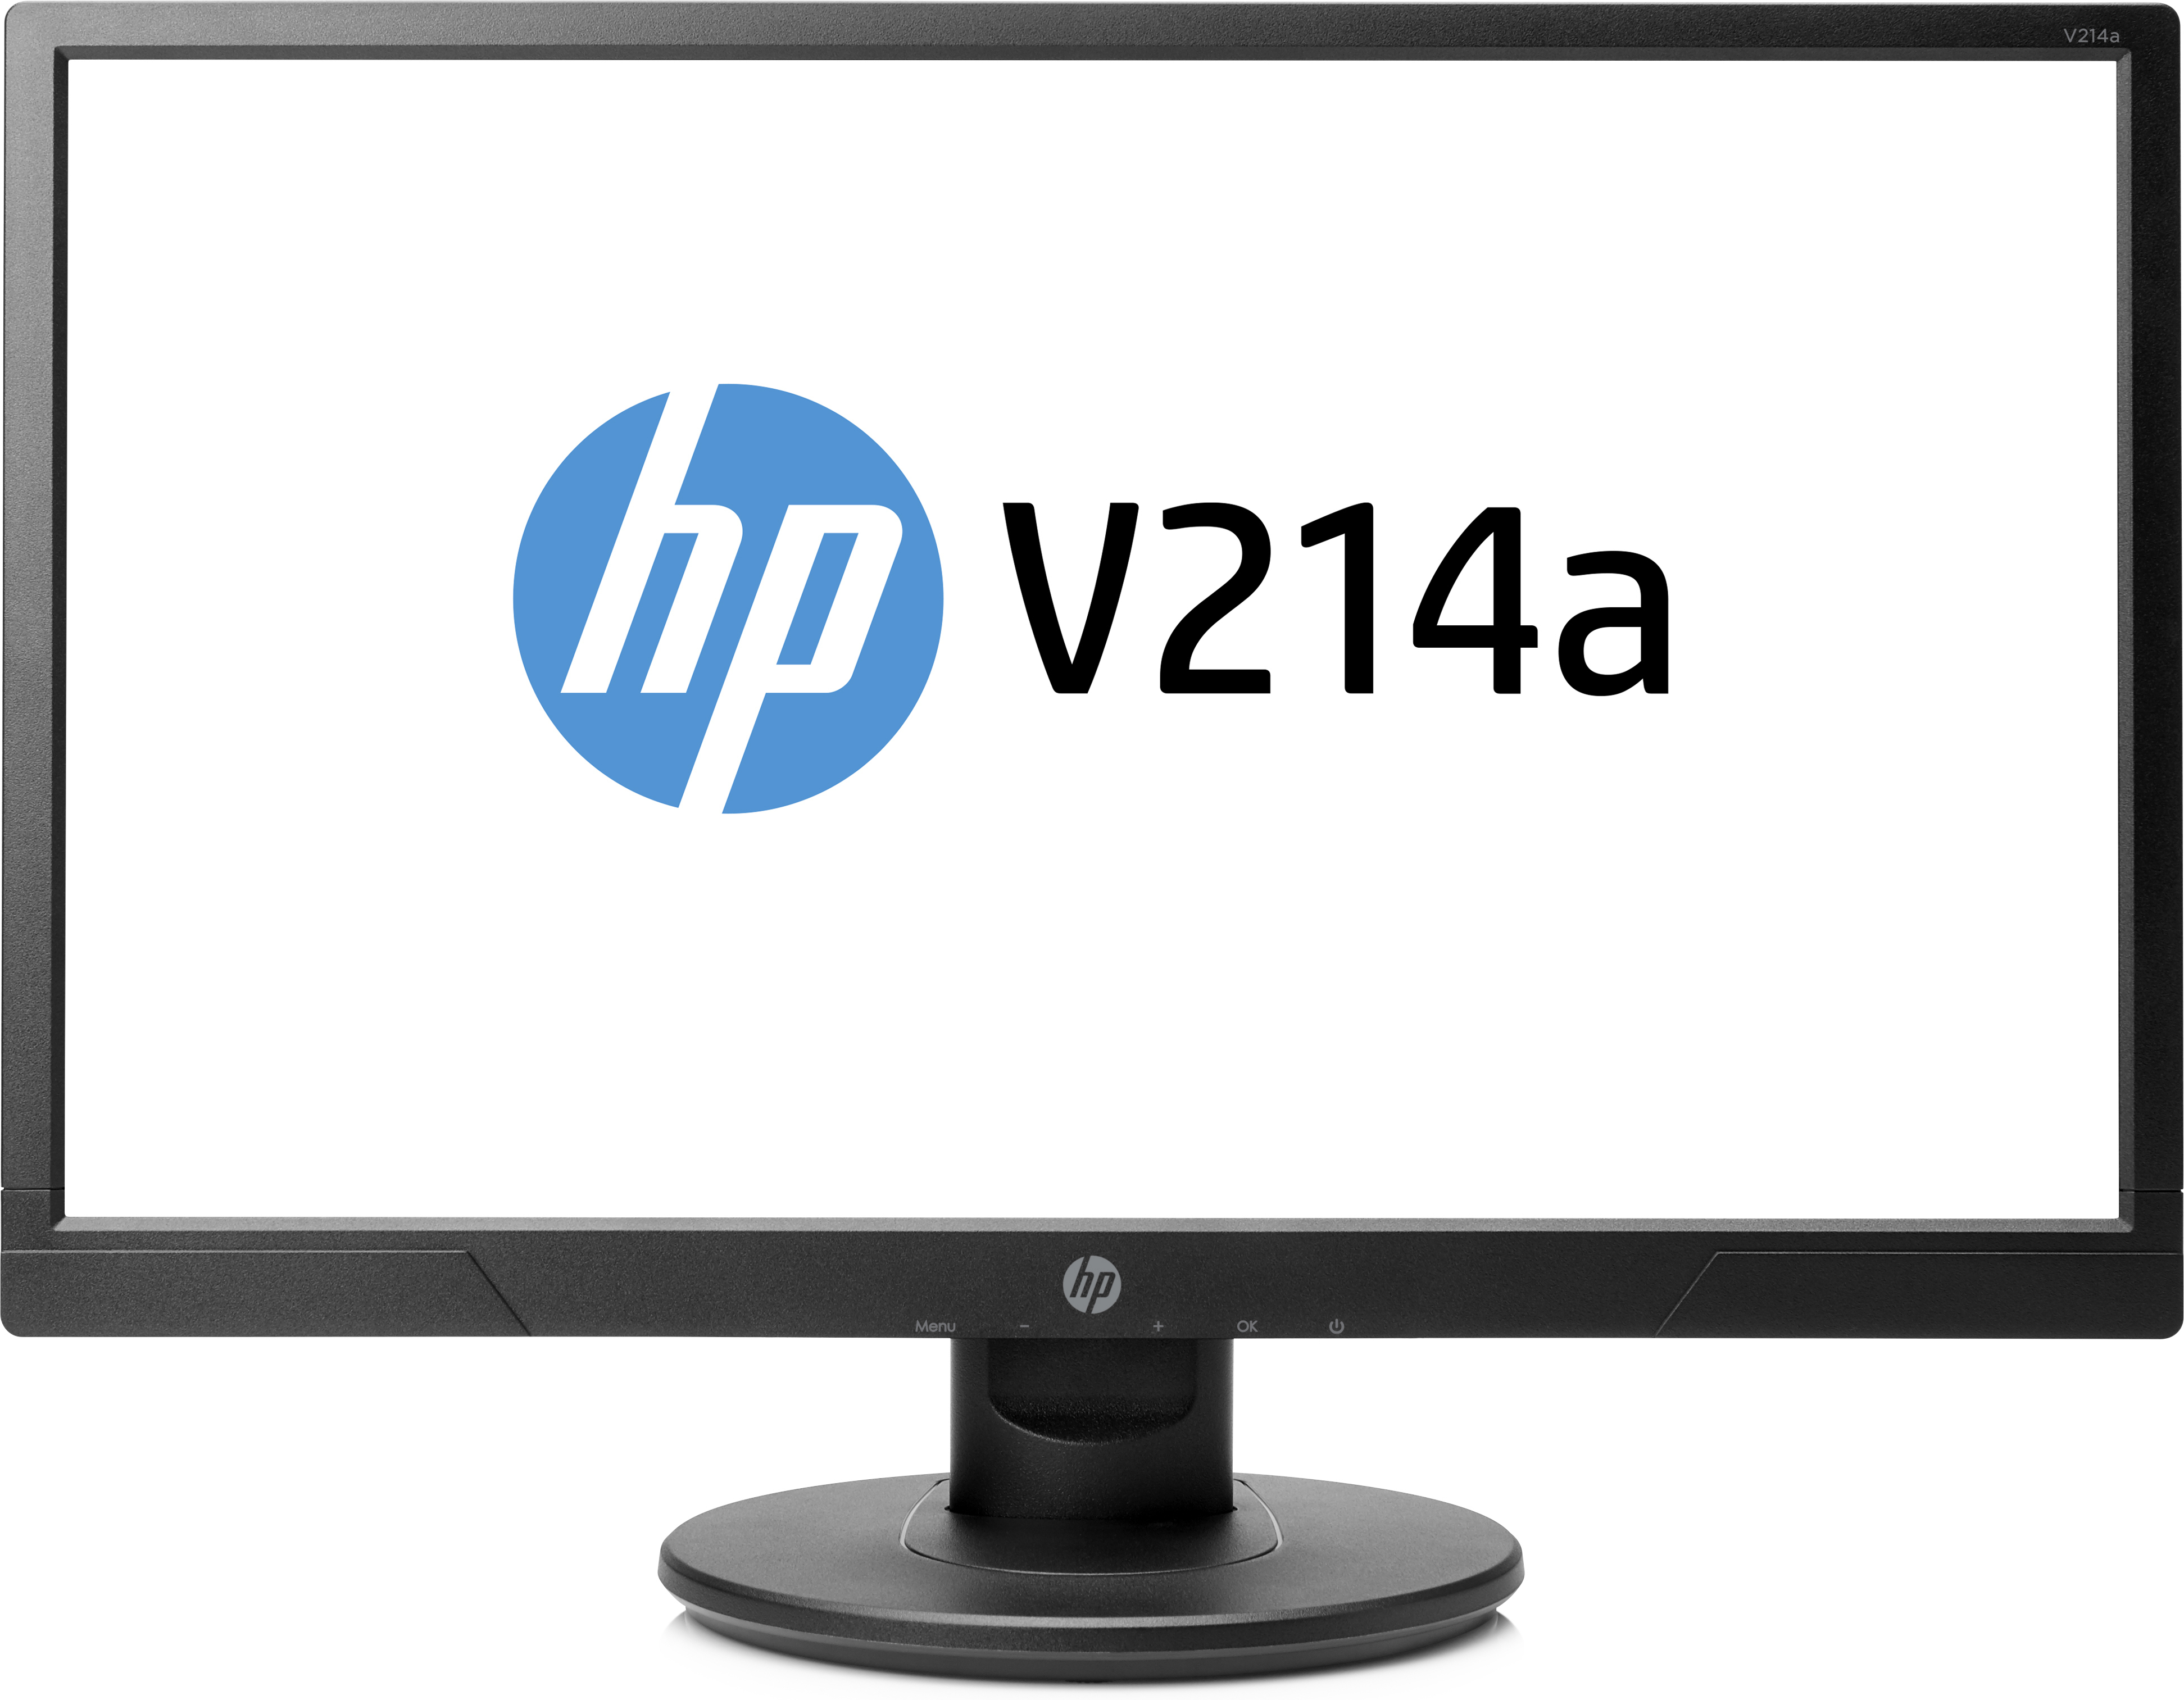 HP V214a/ 20.7'' TN/ 1920x1080 / 600:1 / 5ms / 200cd/ VGA, HDMI/ audio 2x1W, 1/1/0